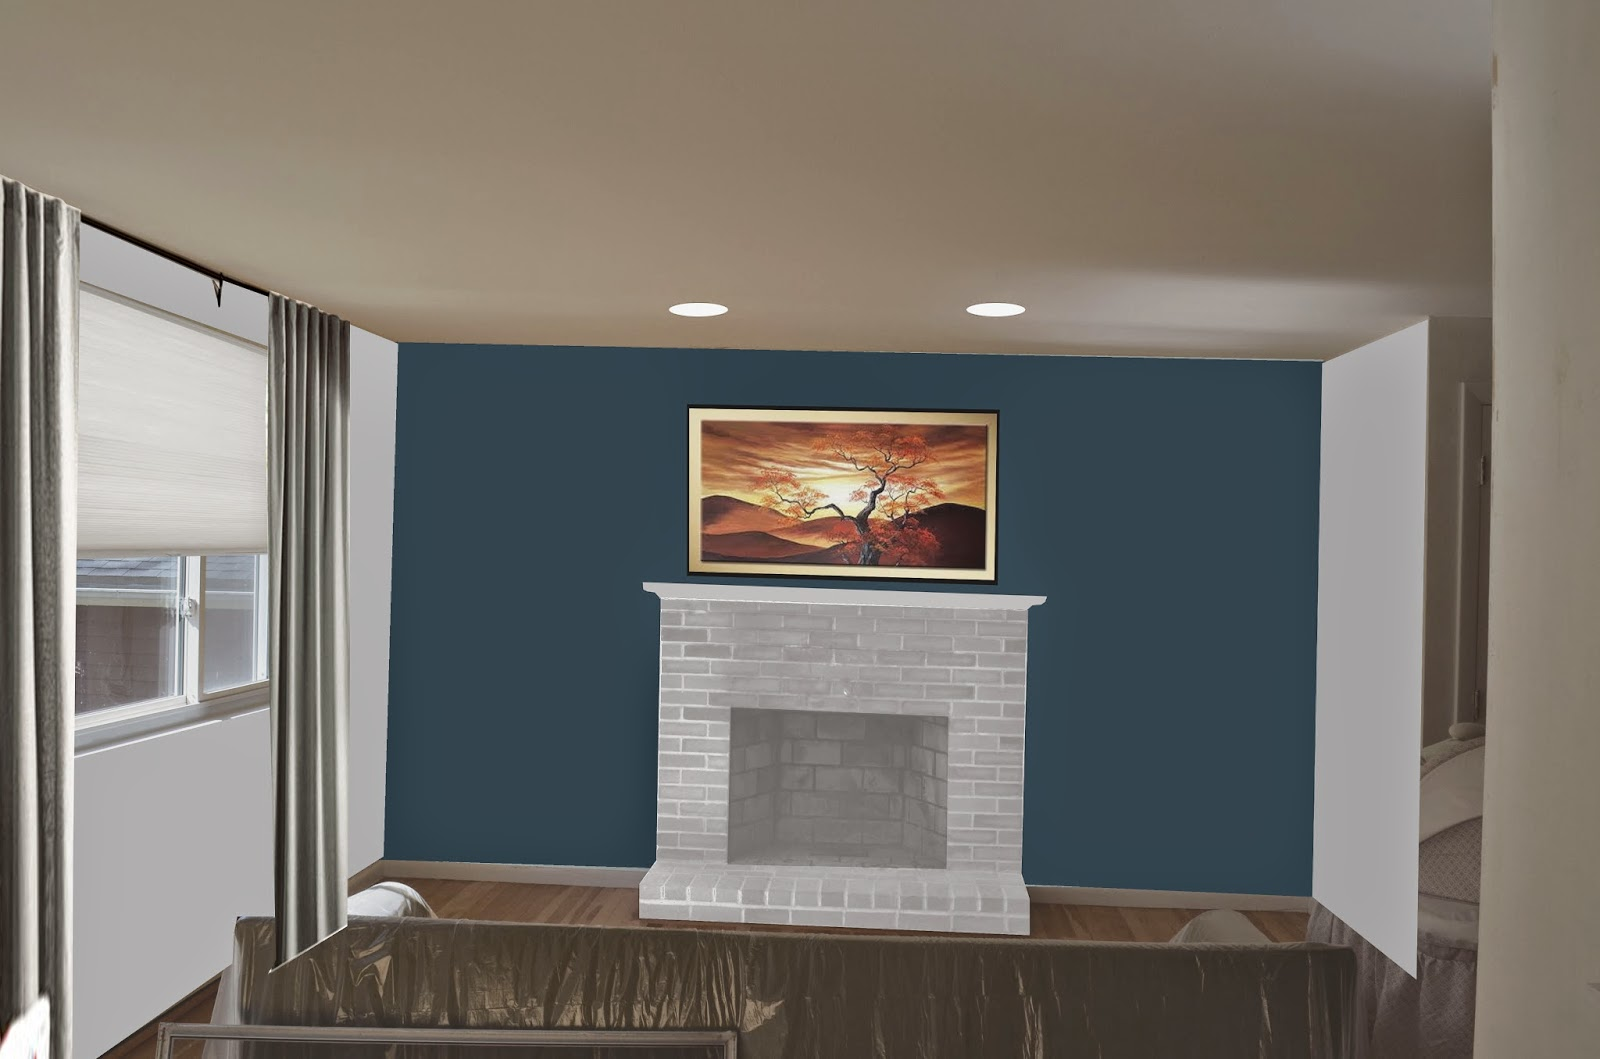 WEAFER DESIGN: Living Room/Dining Room Paint colors